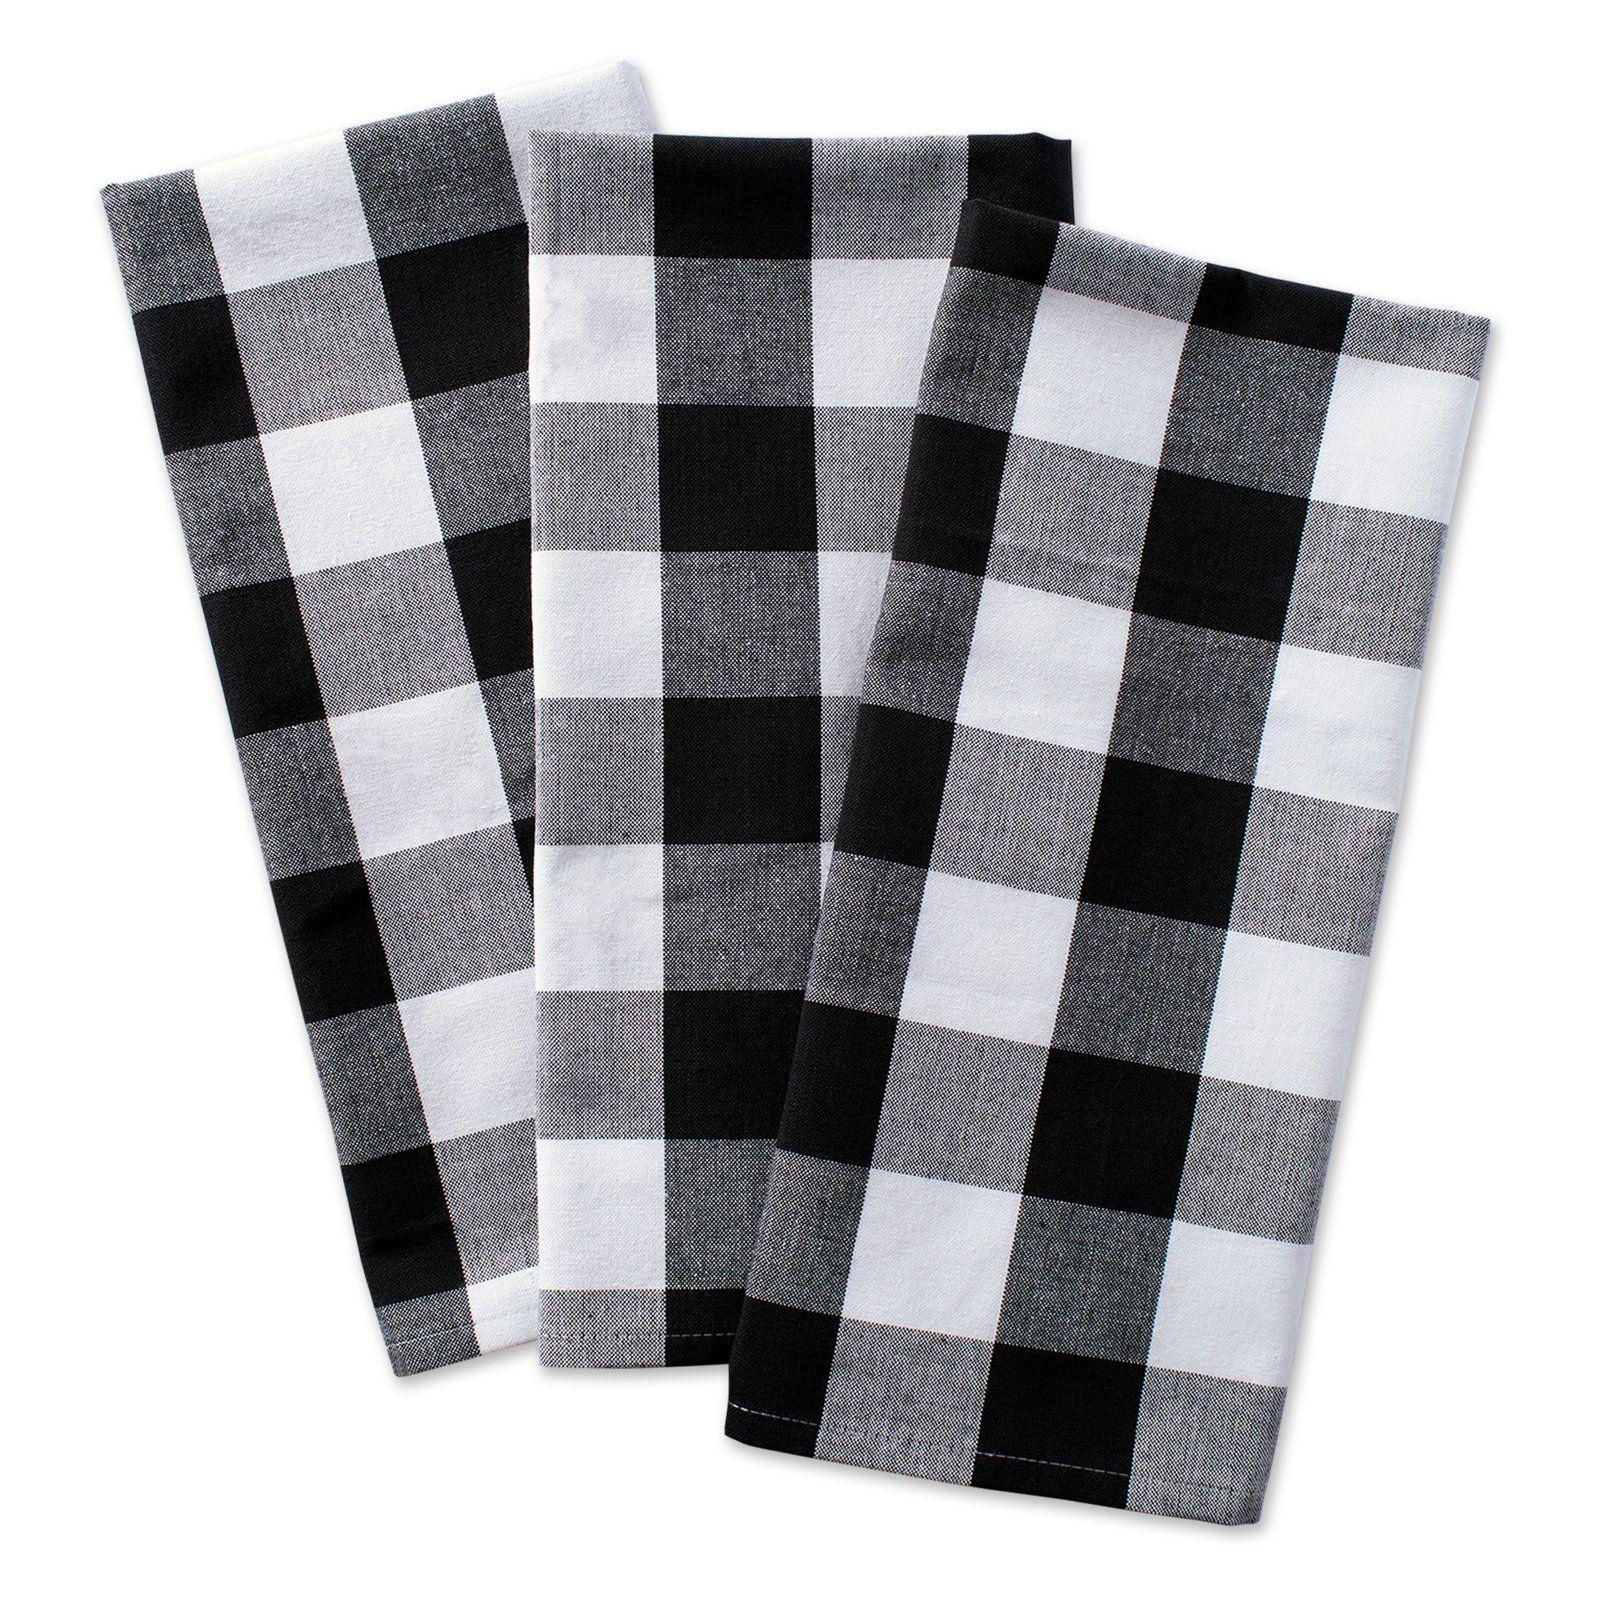 Paisley Floral On Black Hanging Kitchen Dish Towel Black Dish Towel Button Top Towel Black Floral Kitchen Towel Kitchen Dish Towel Dish Towels Black Floral